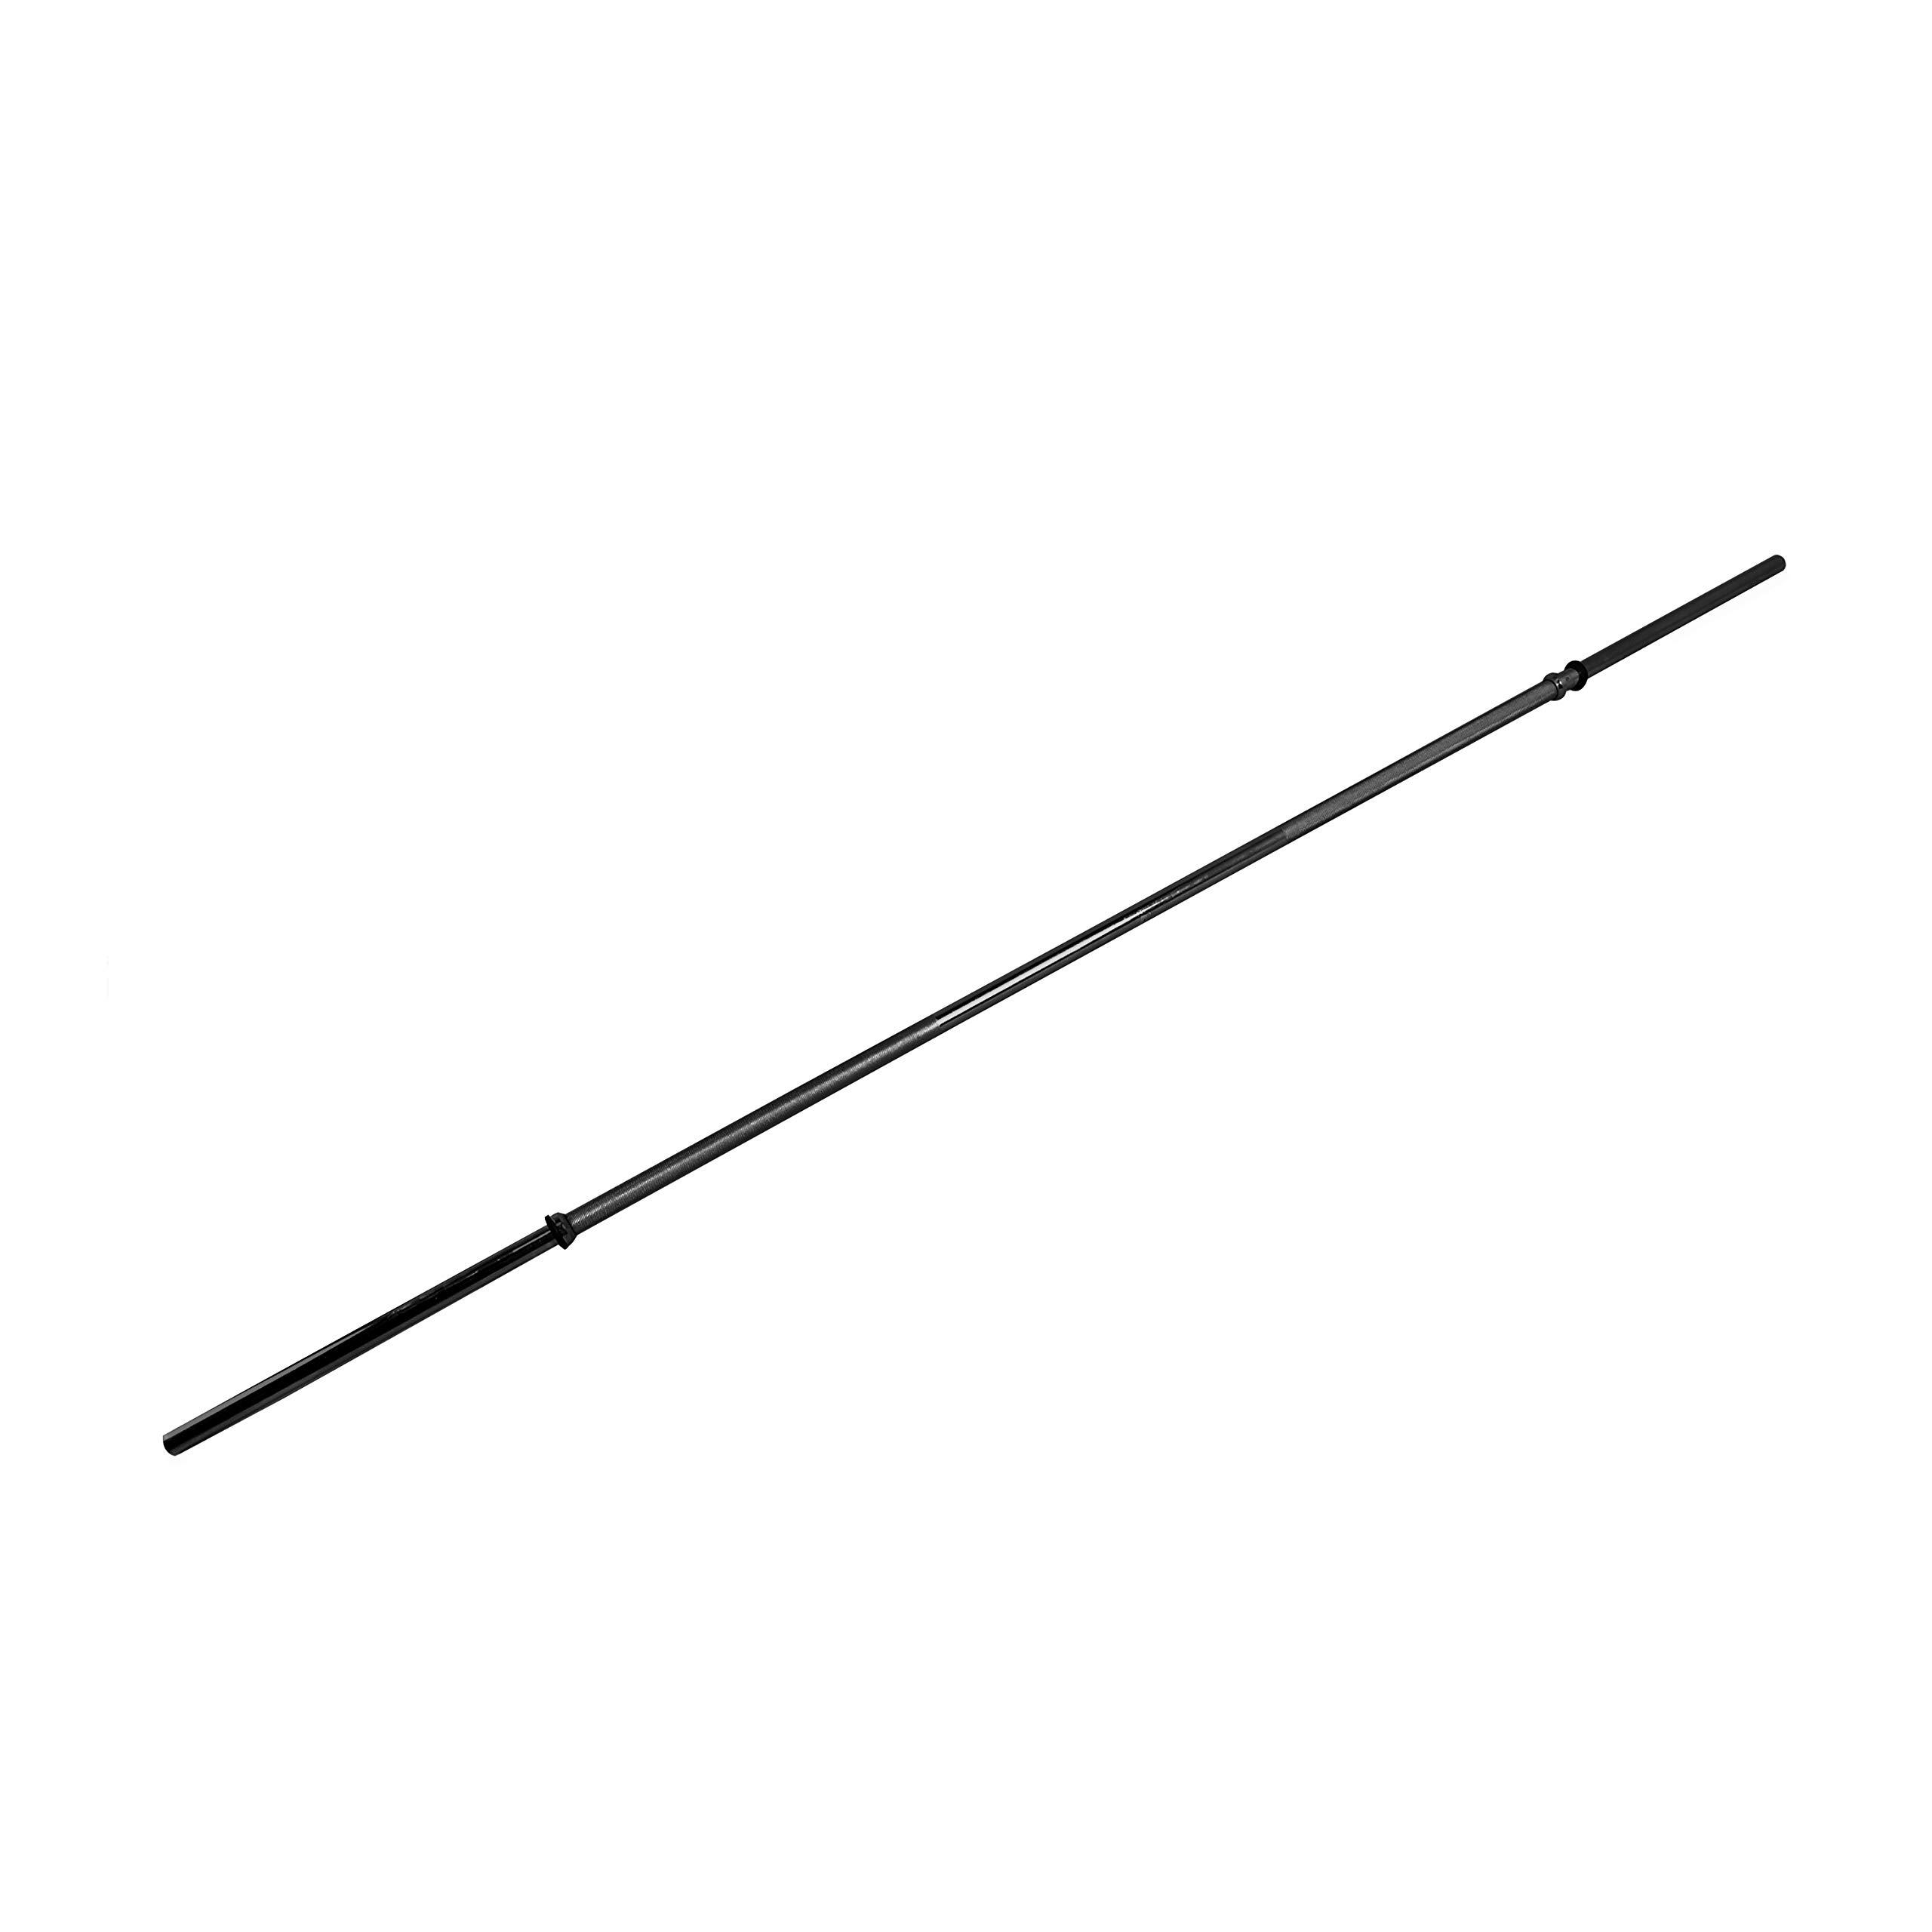 CAP Barbell 84'' Regular Solid Bar, Black